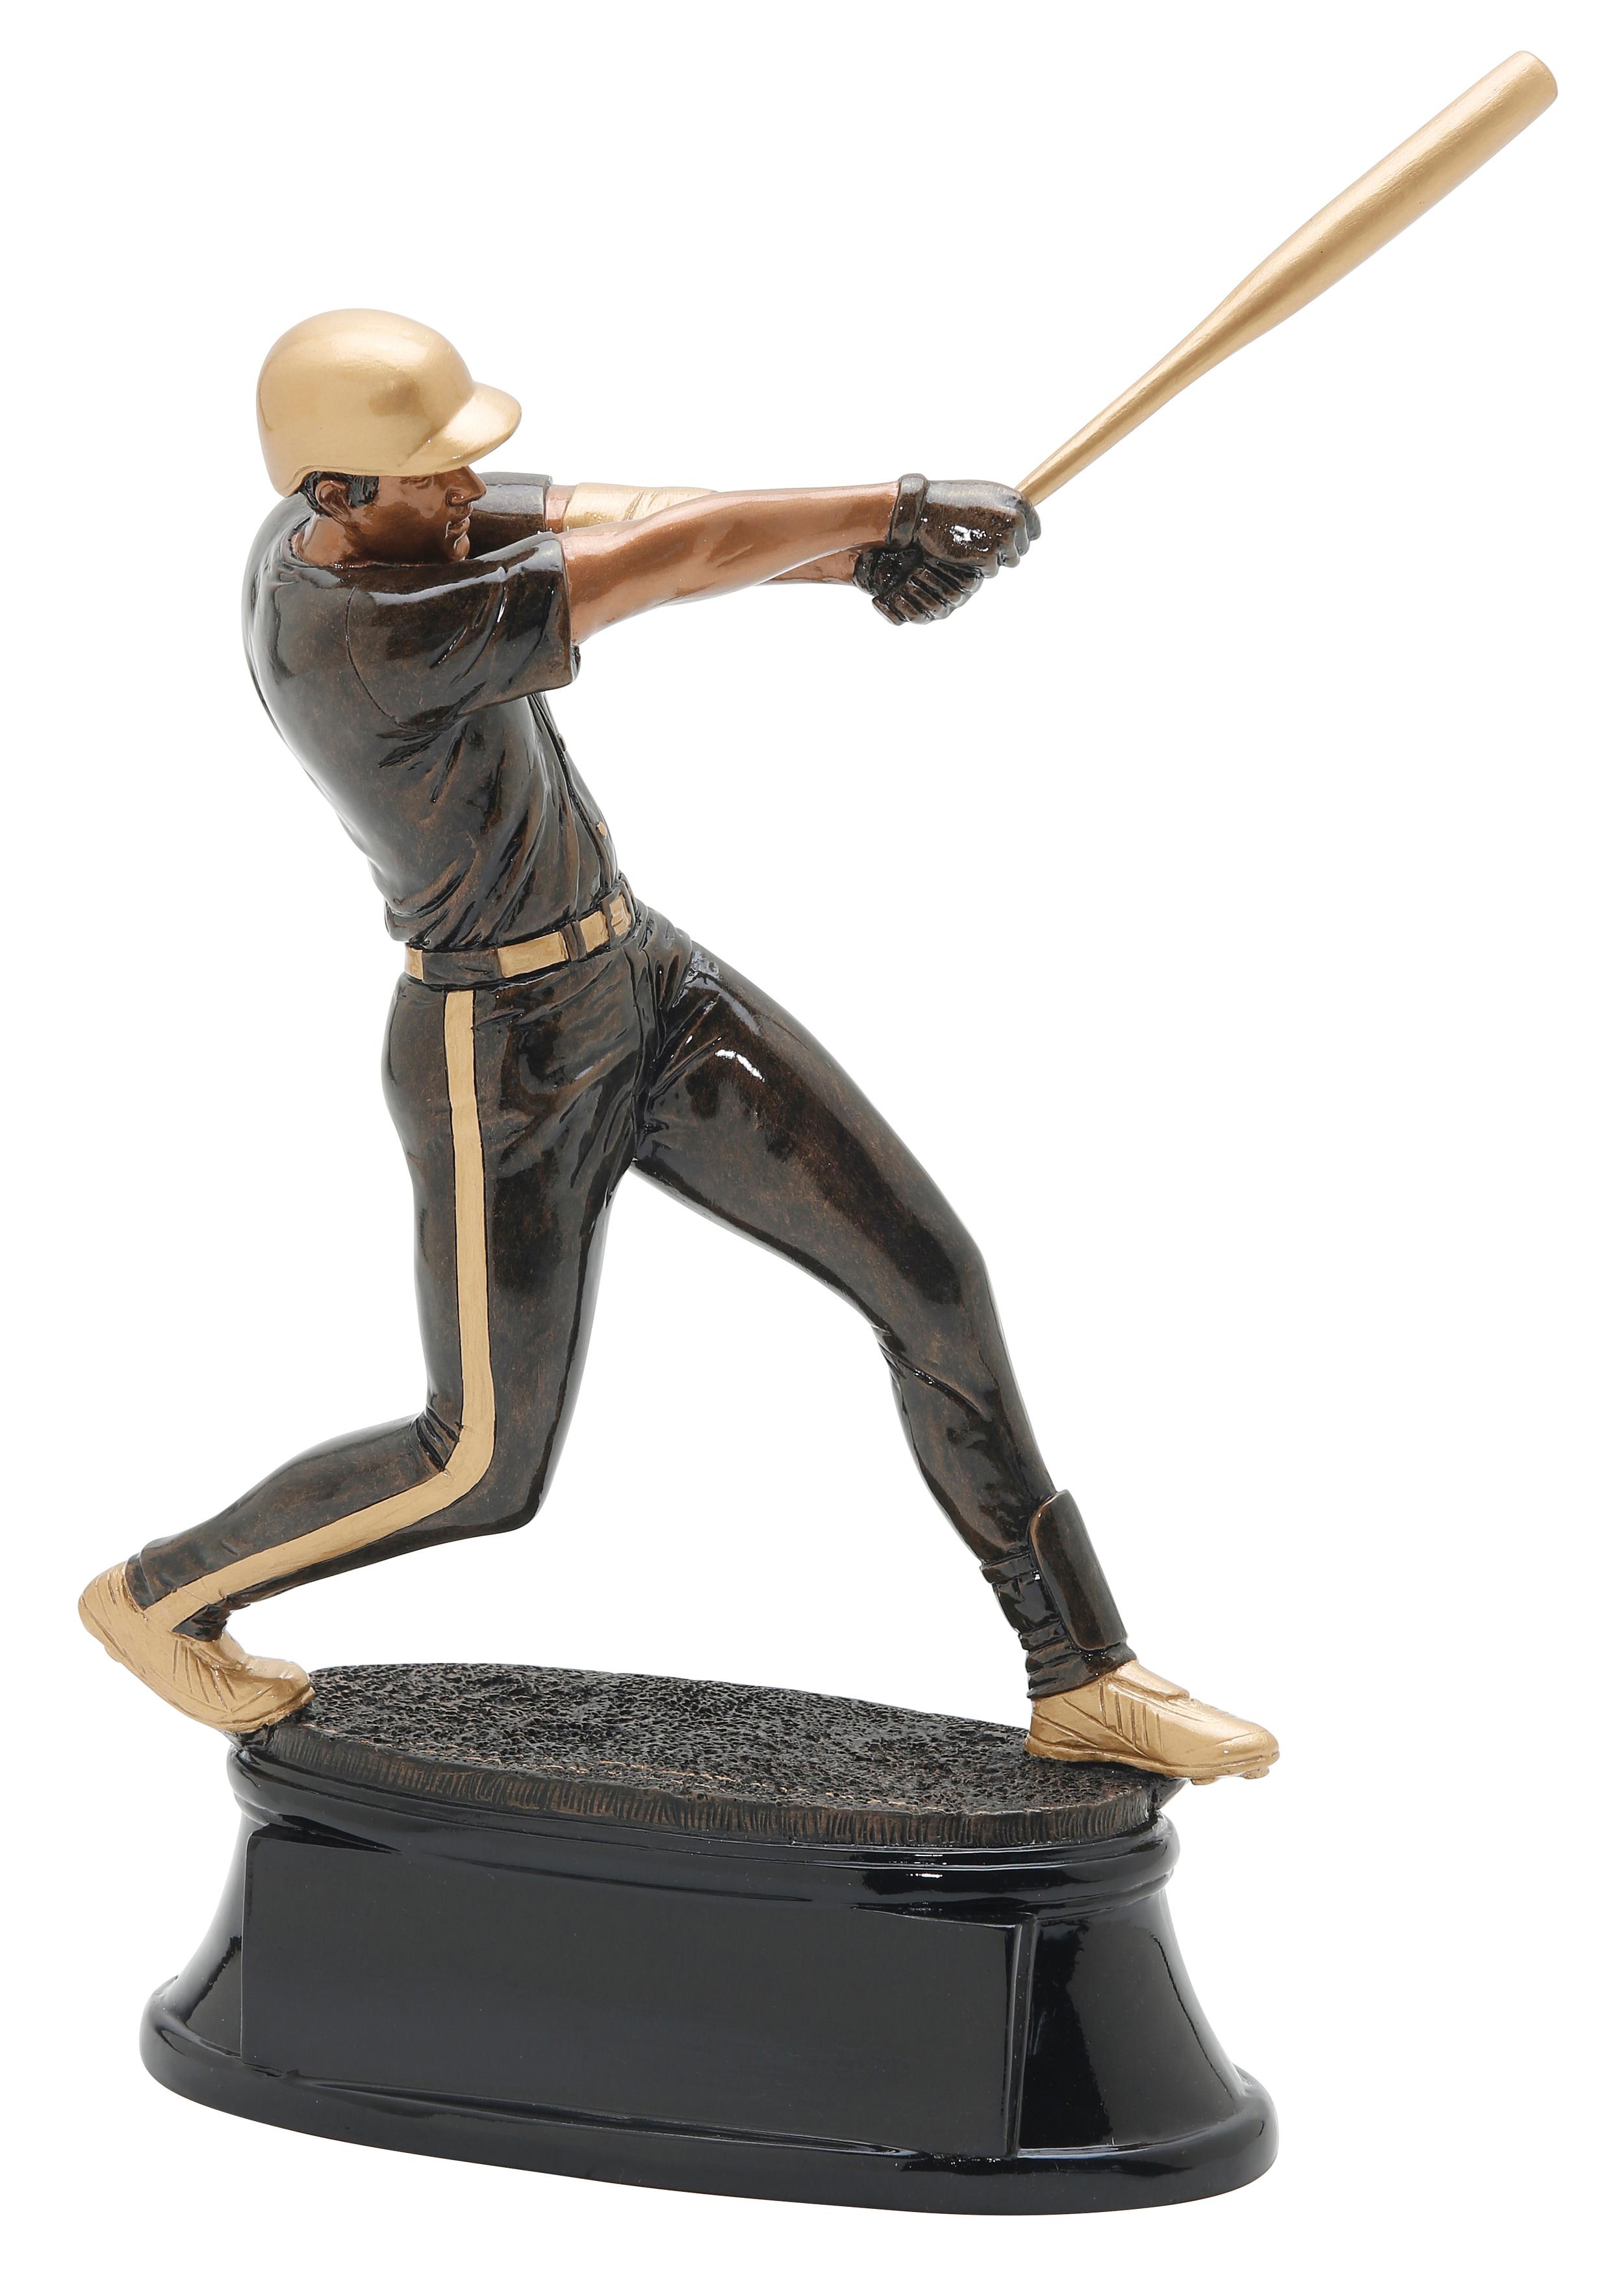 "Baseball -   X-Large - 90703GS - 11.5"" tall  Large - 90603GS - 9.5"" tall  Medium - 90503GS - 7.25"" tall  Small - 90403GS - 6"" tall"